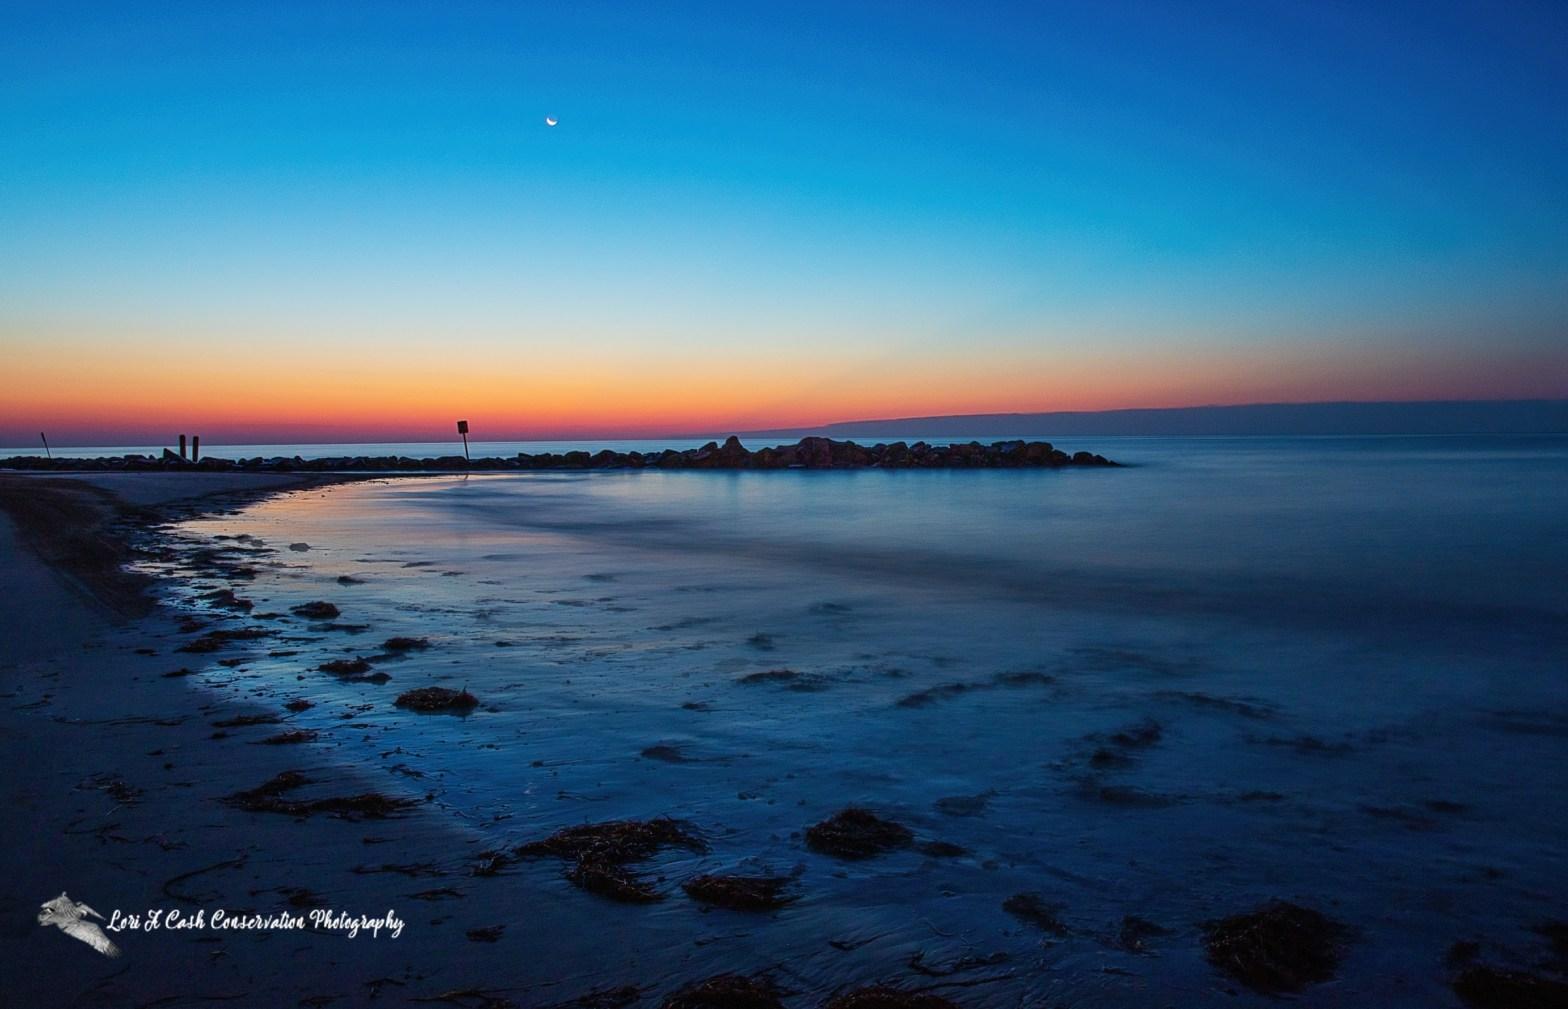 Crescent moon at twilight on a summer morning at Buckroe Beach in Hampton, Virginia.